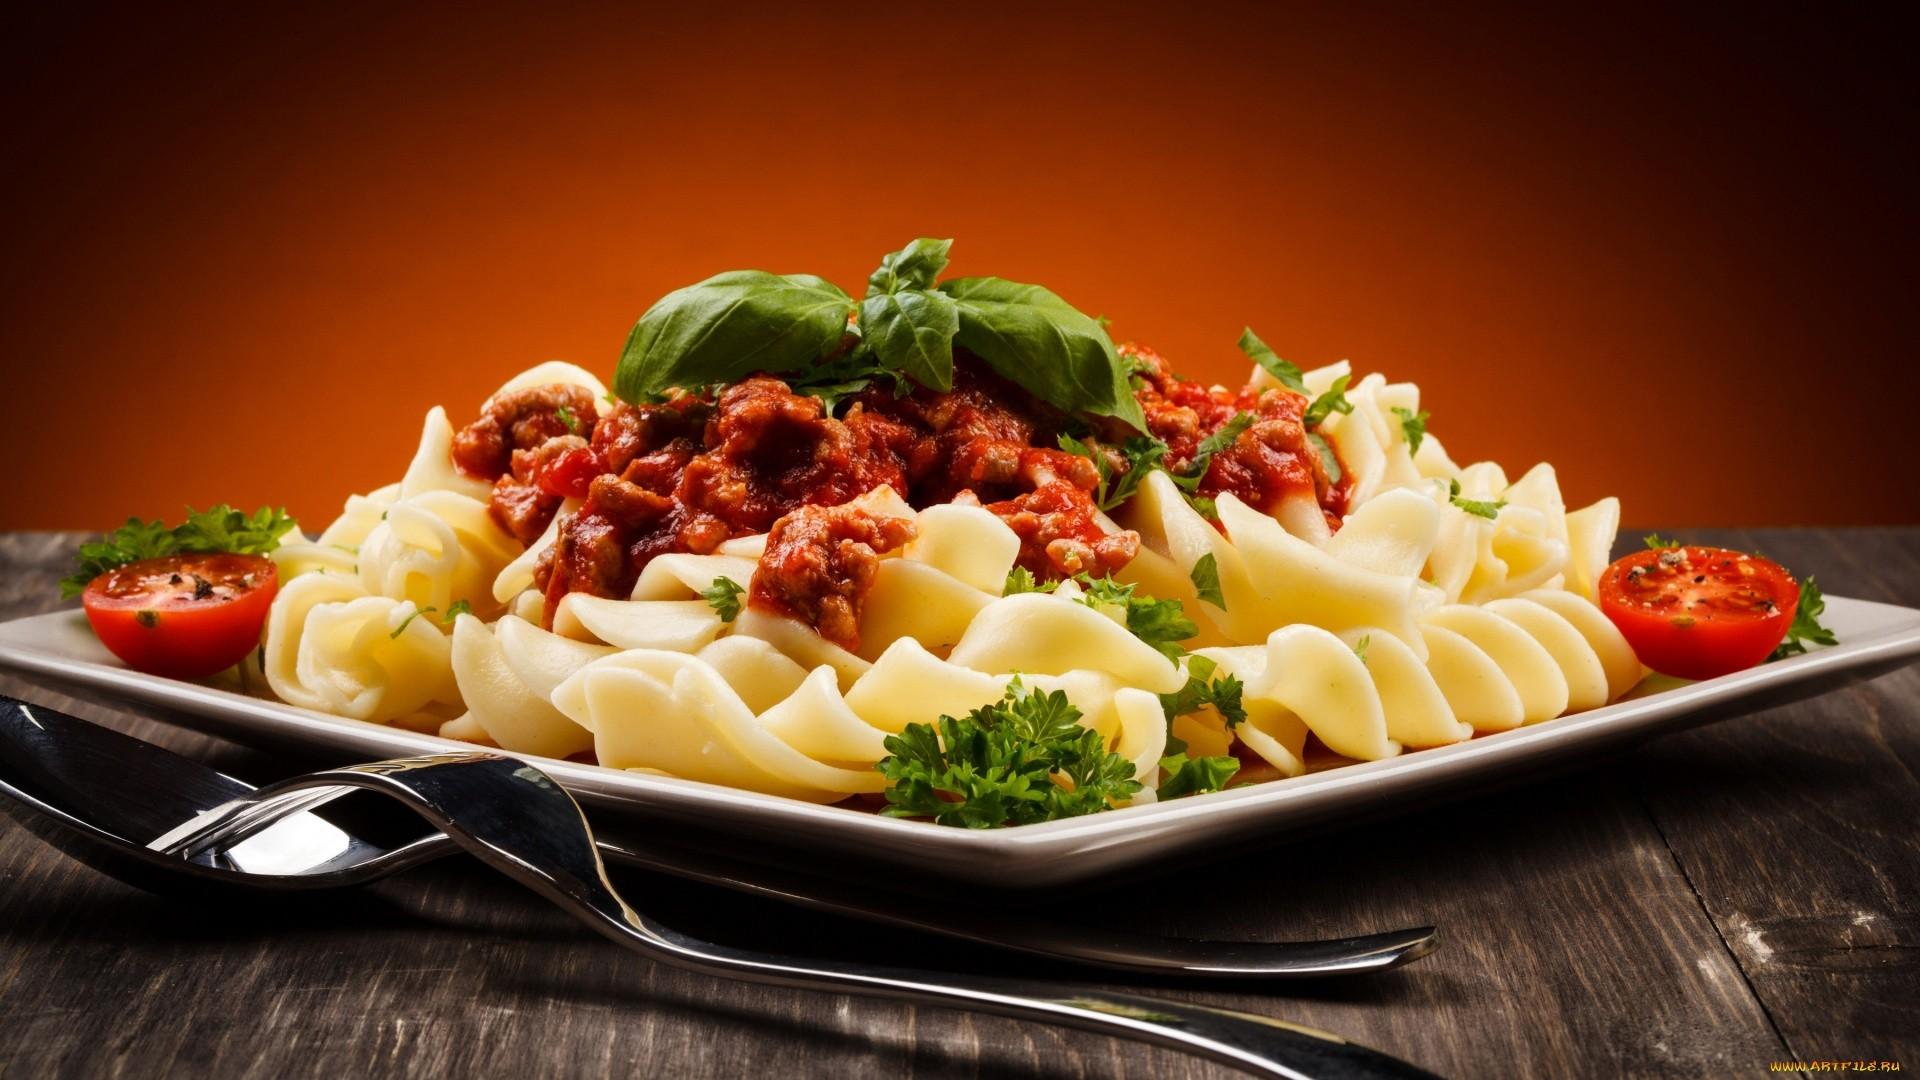 Pasta wallpaper photo hd